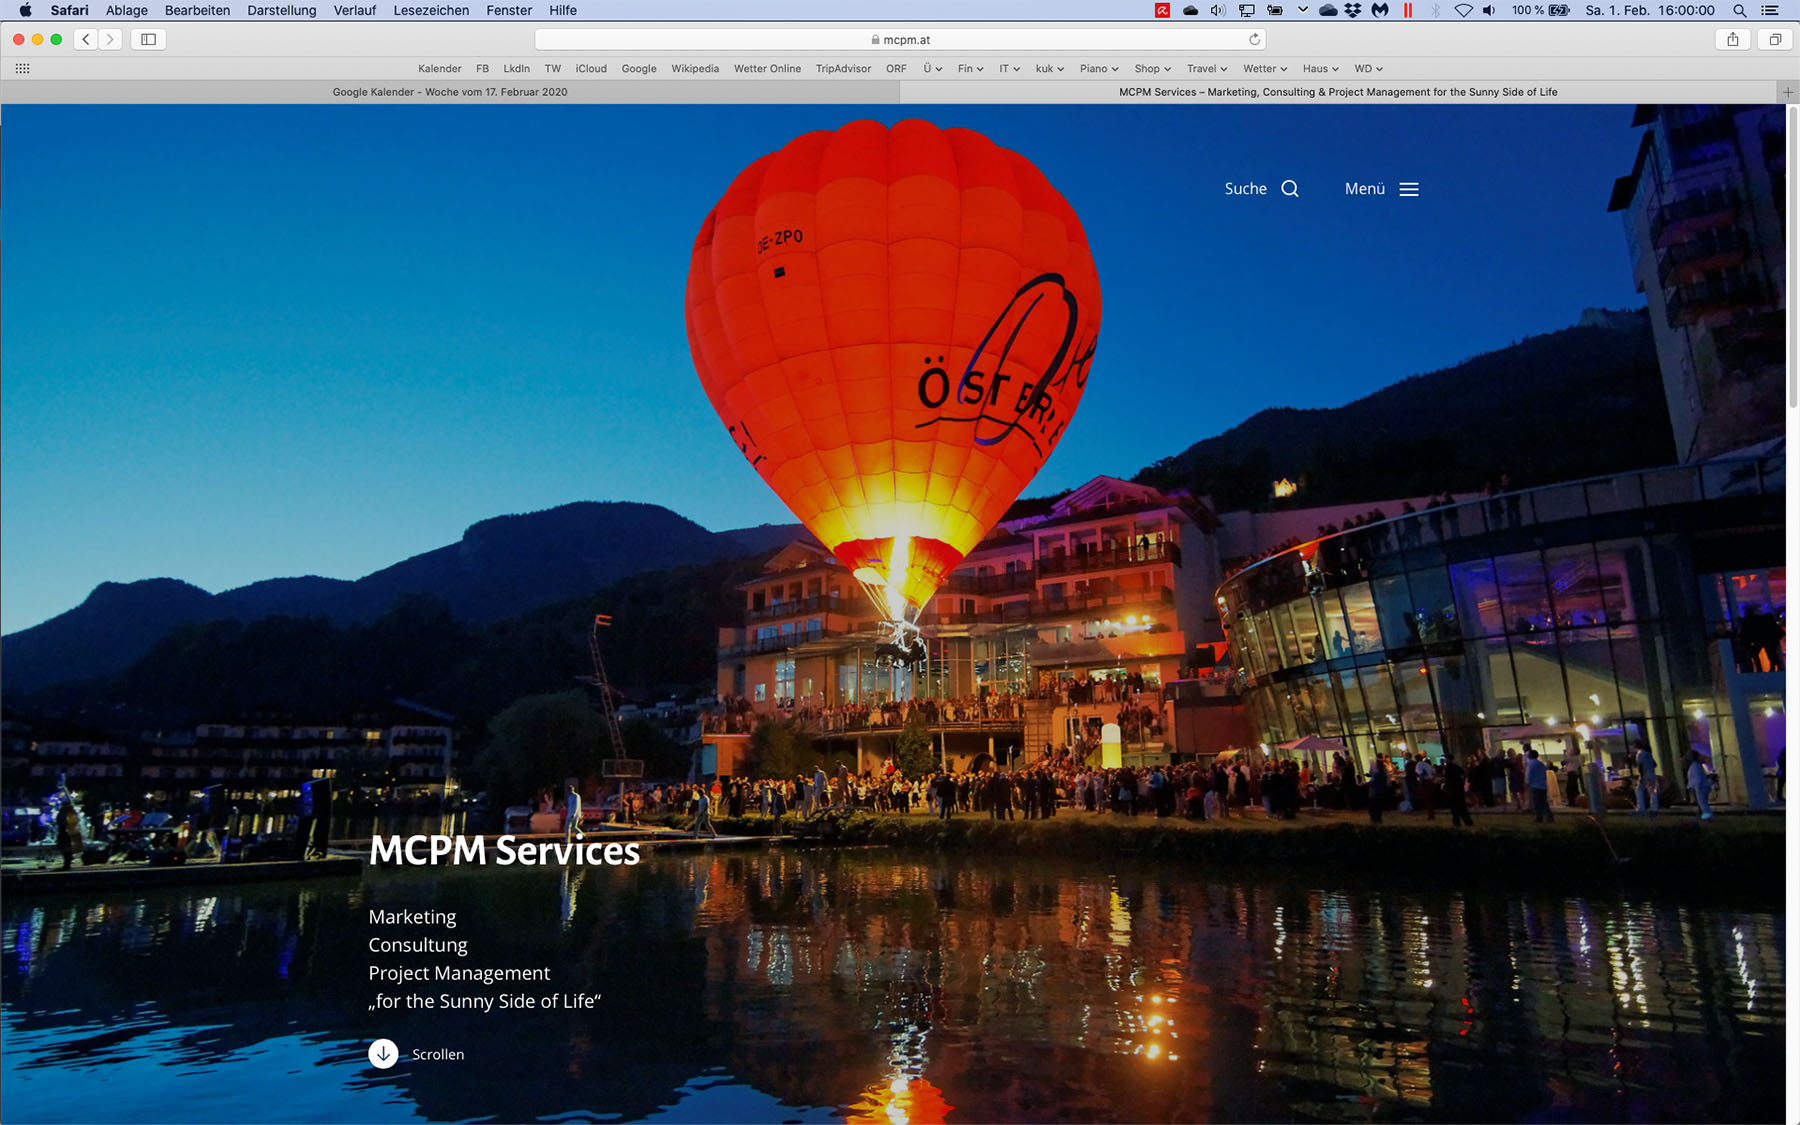 MCPM Startseite Jan 2020